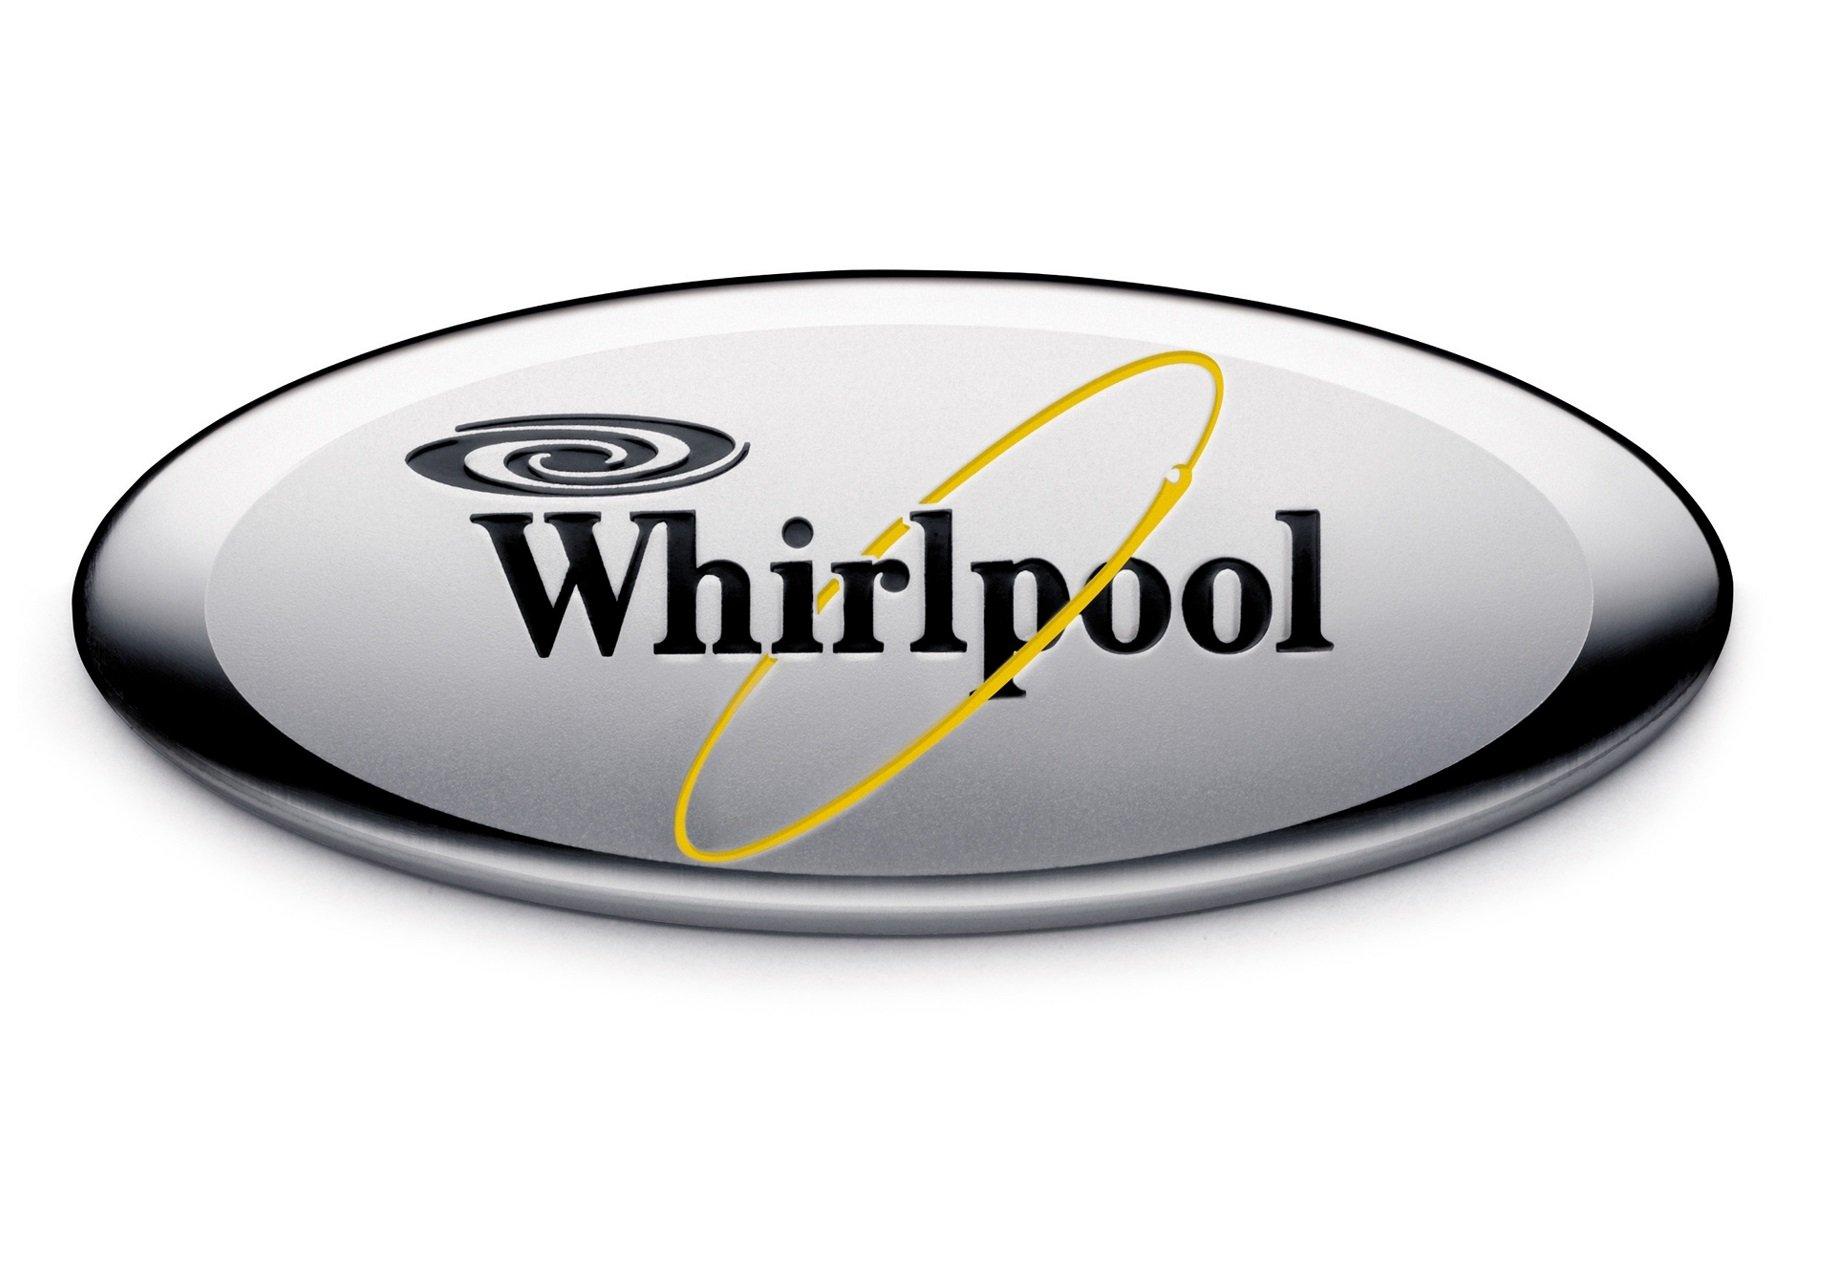 Whirlpool W10899966 Hose, gray by Whirlpool